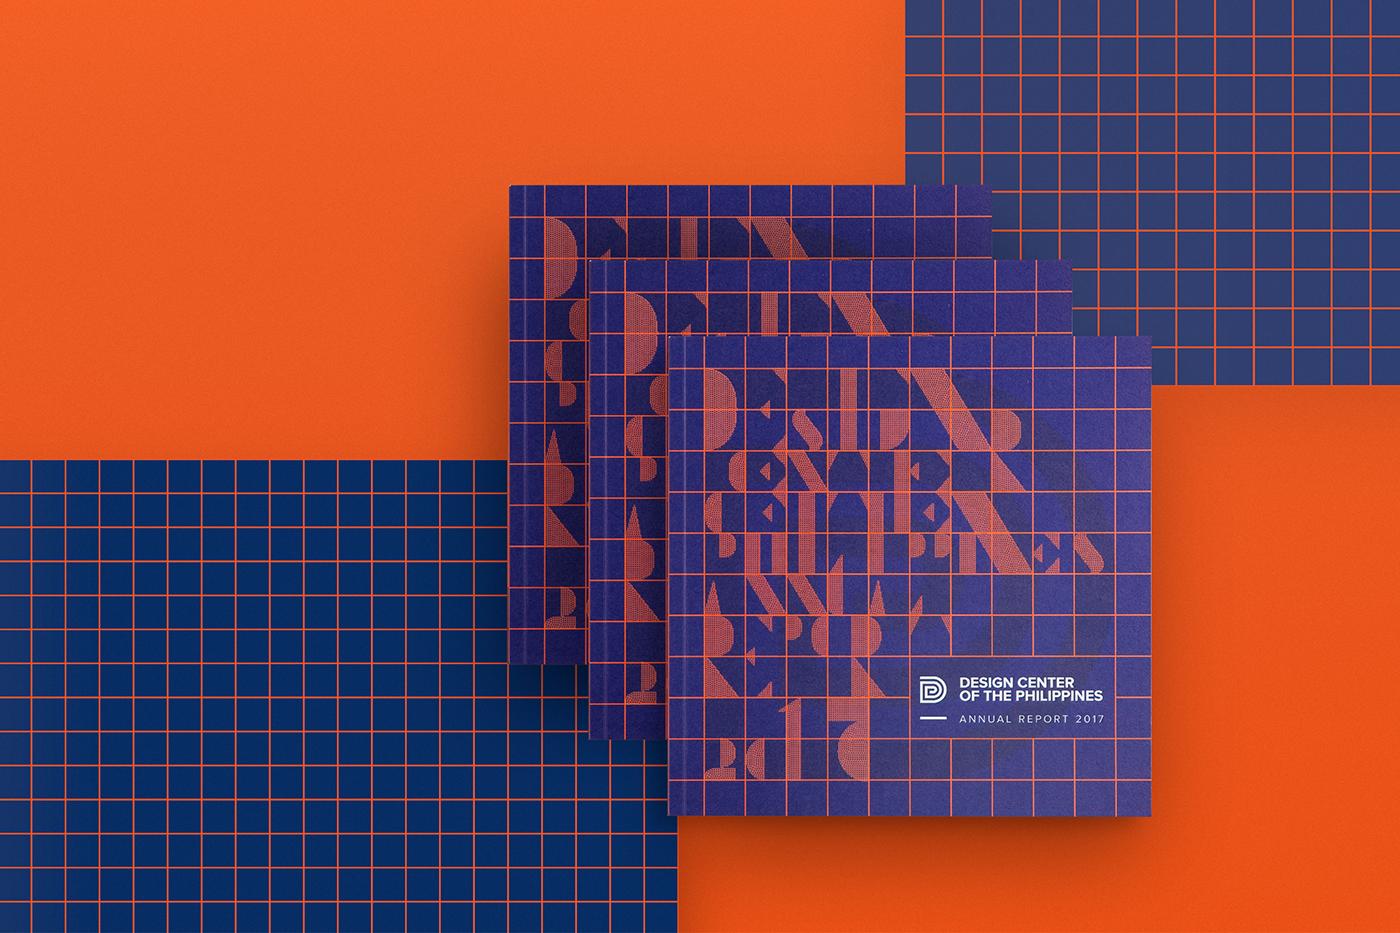 Design Center annual report grid geometric Layout design